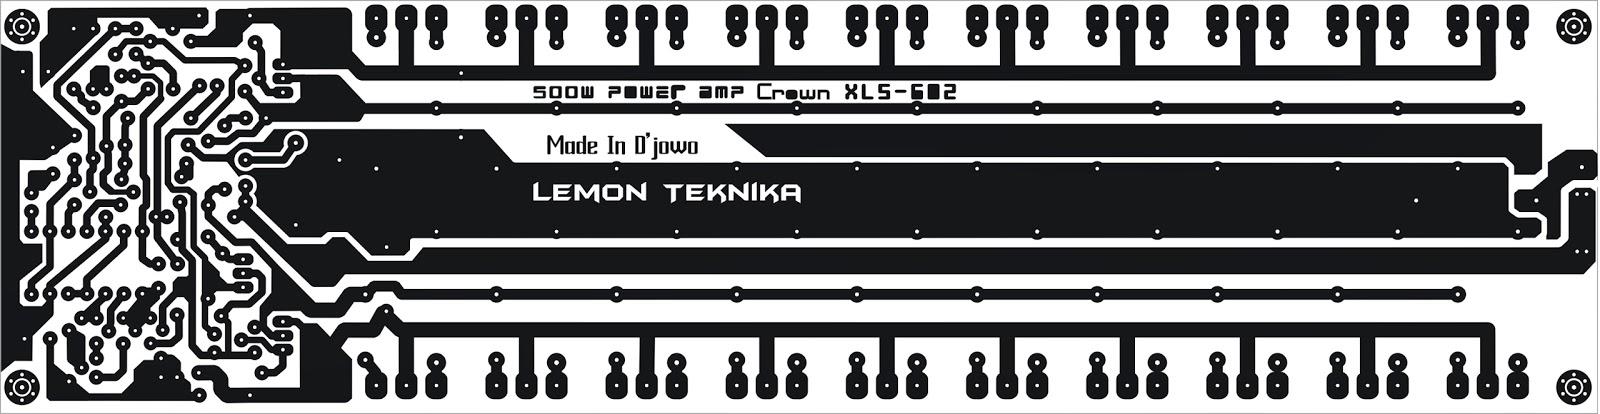 skema power ampli apex h900